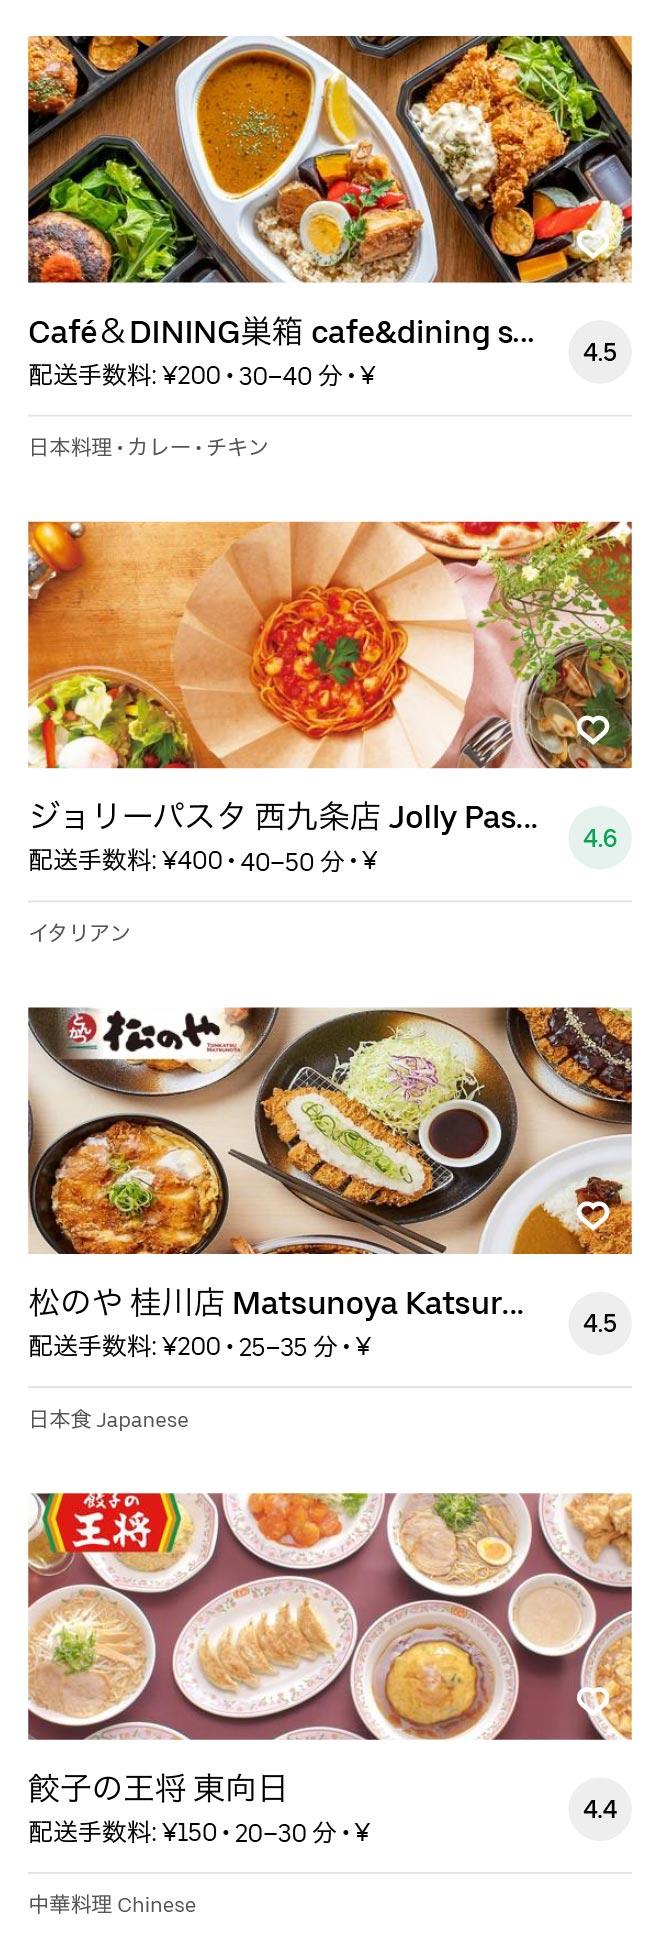 Mukoumachi menu 2008 05